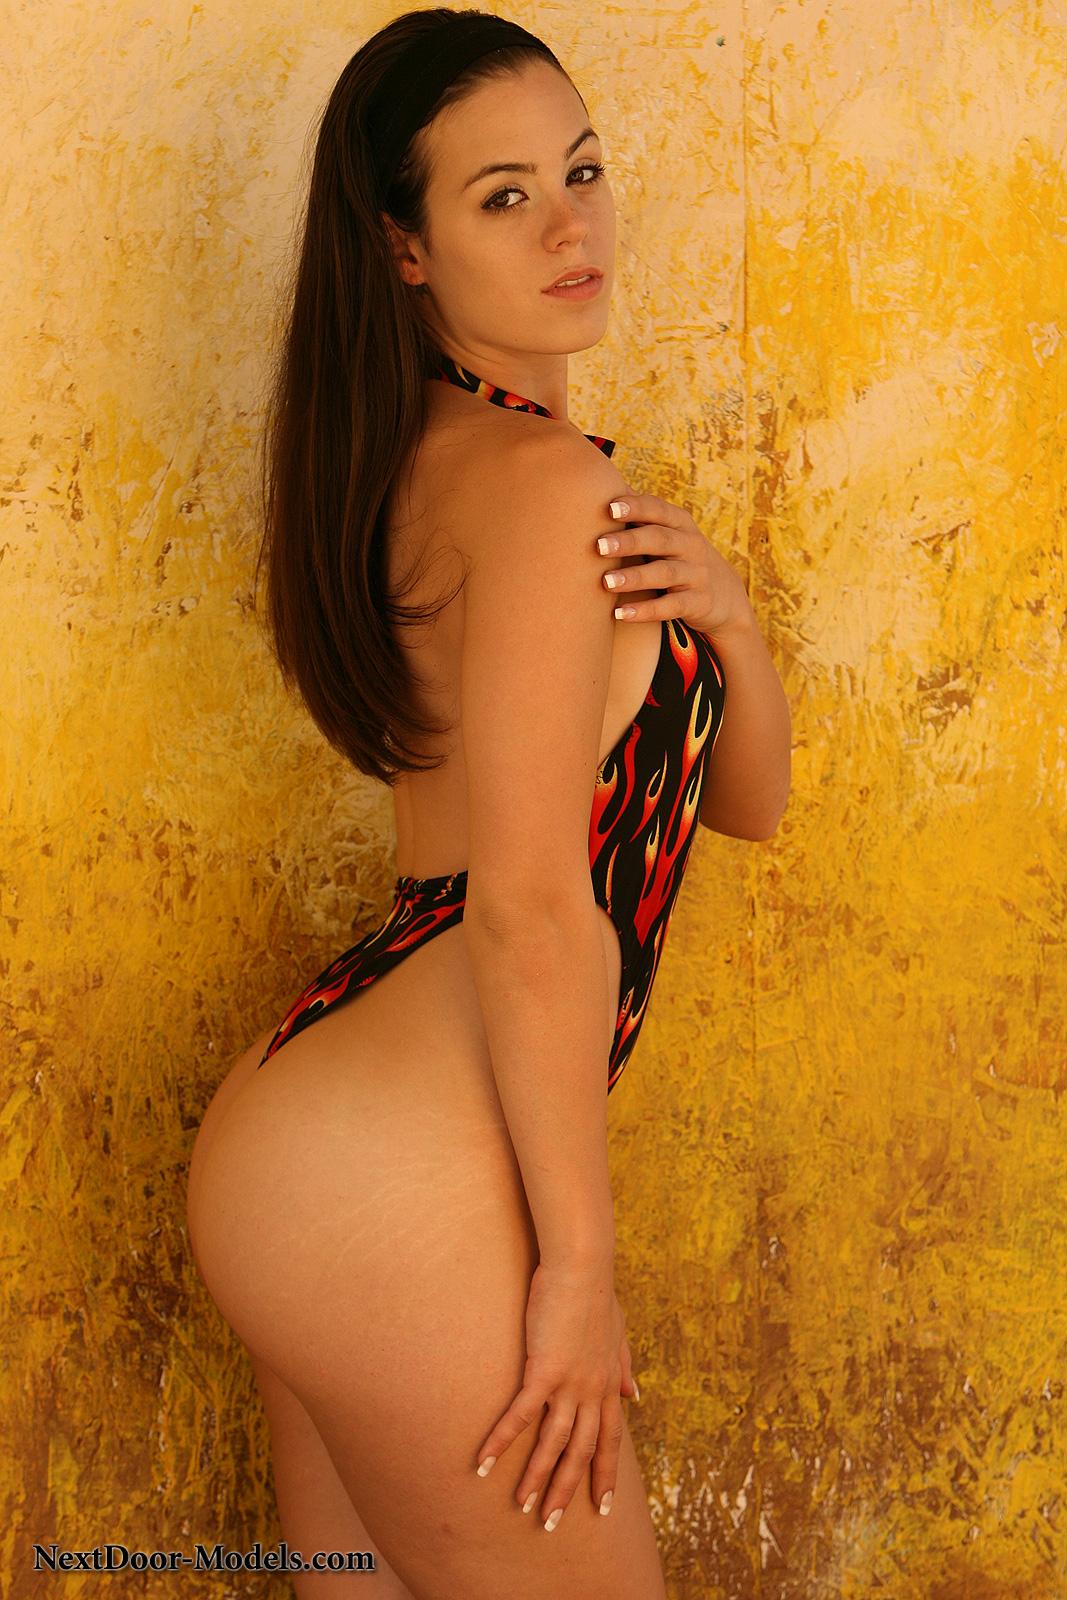 Abby brooks flame bikini